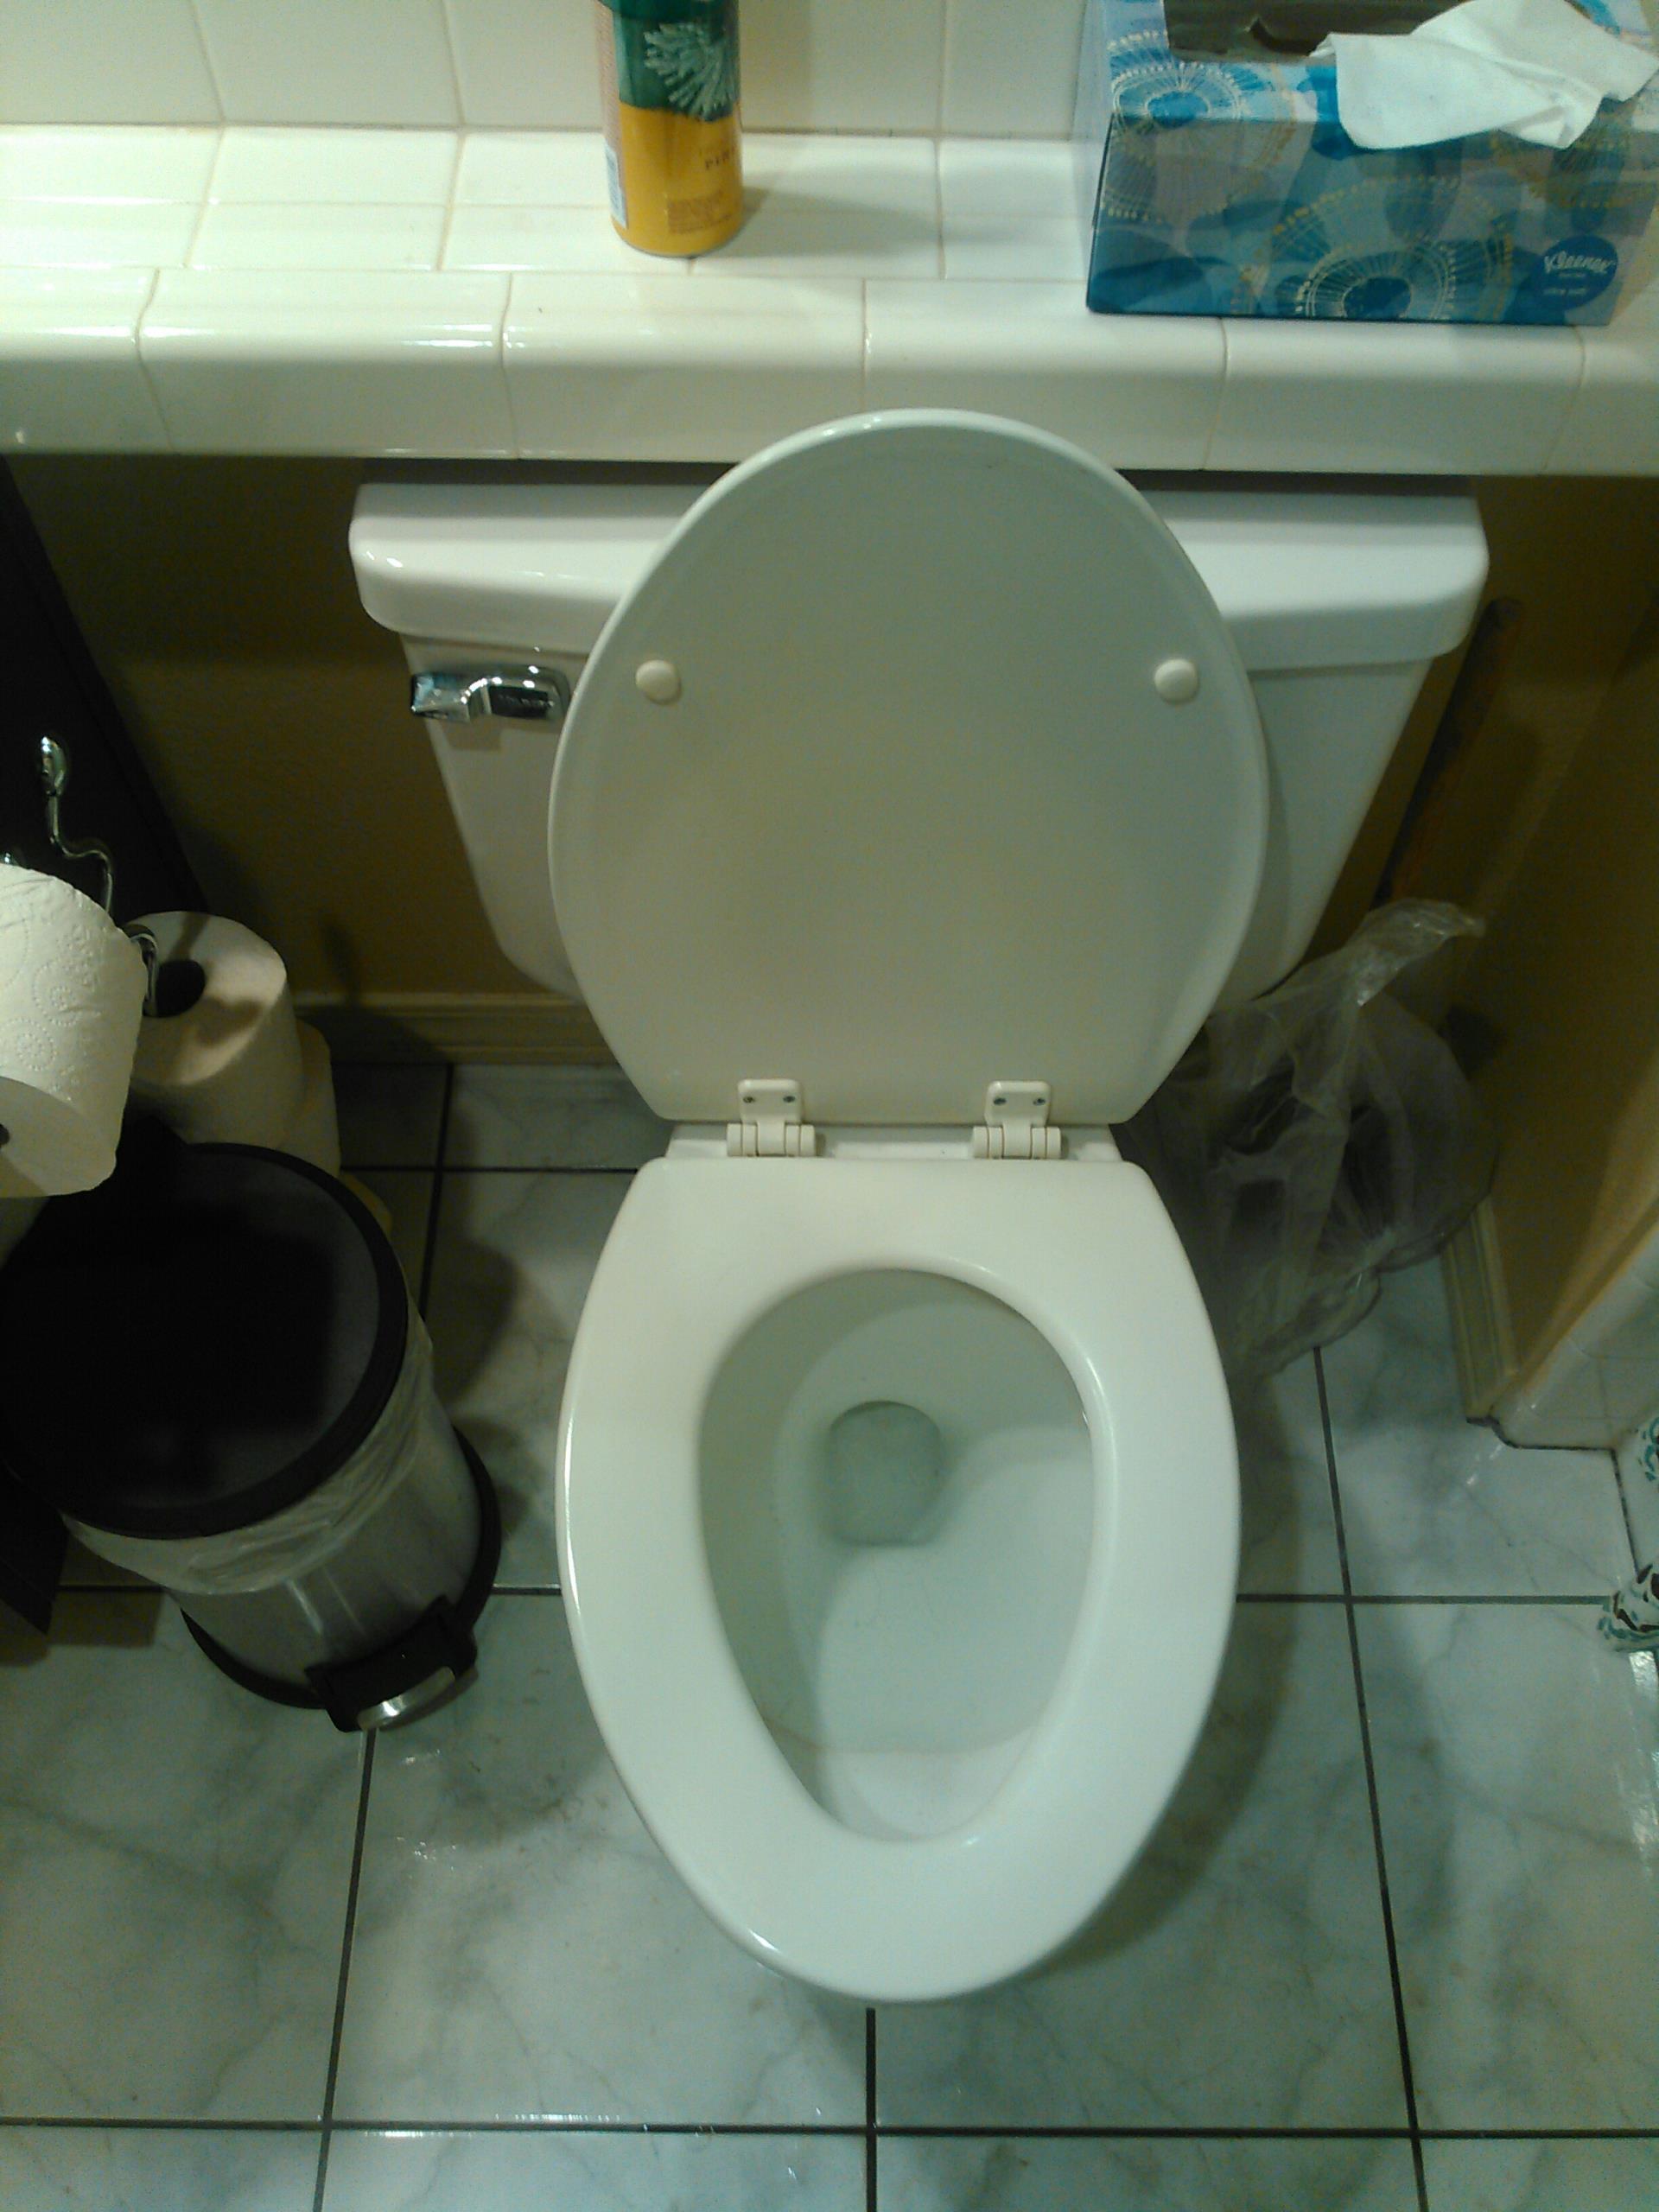 Glendora, CA - Toilet stoppage